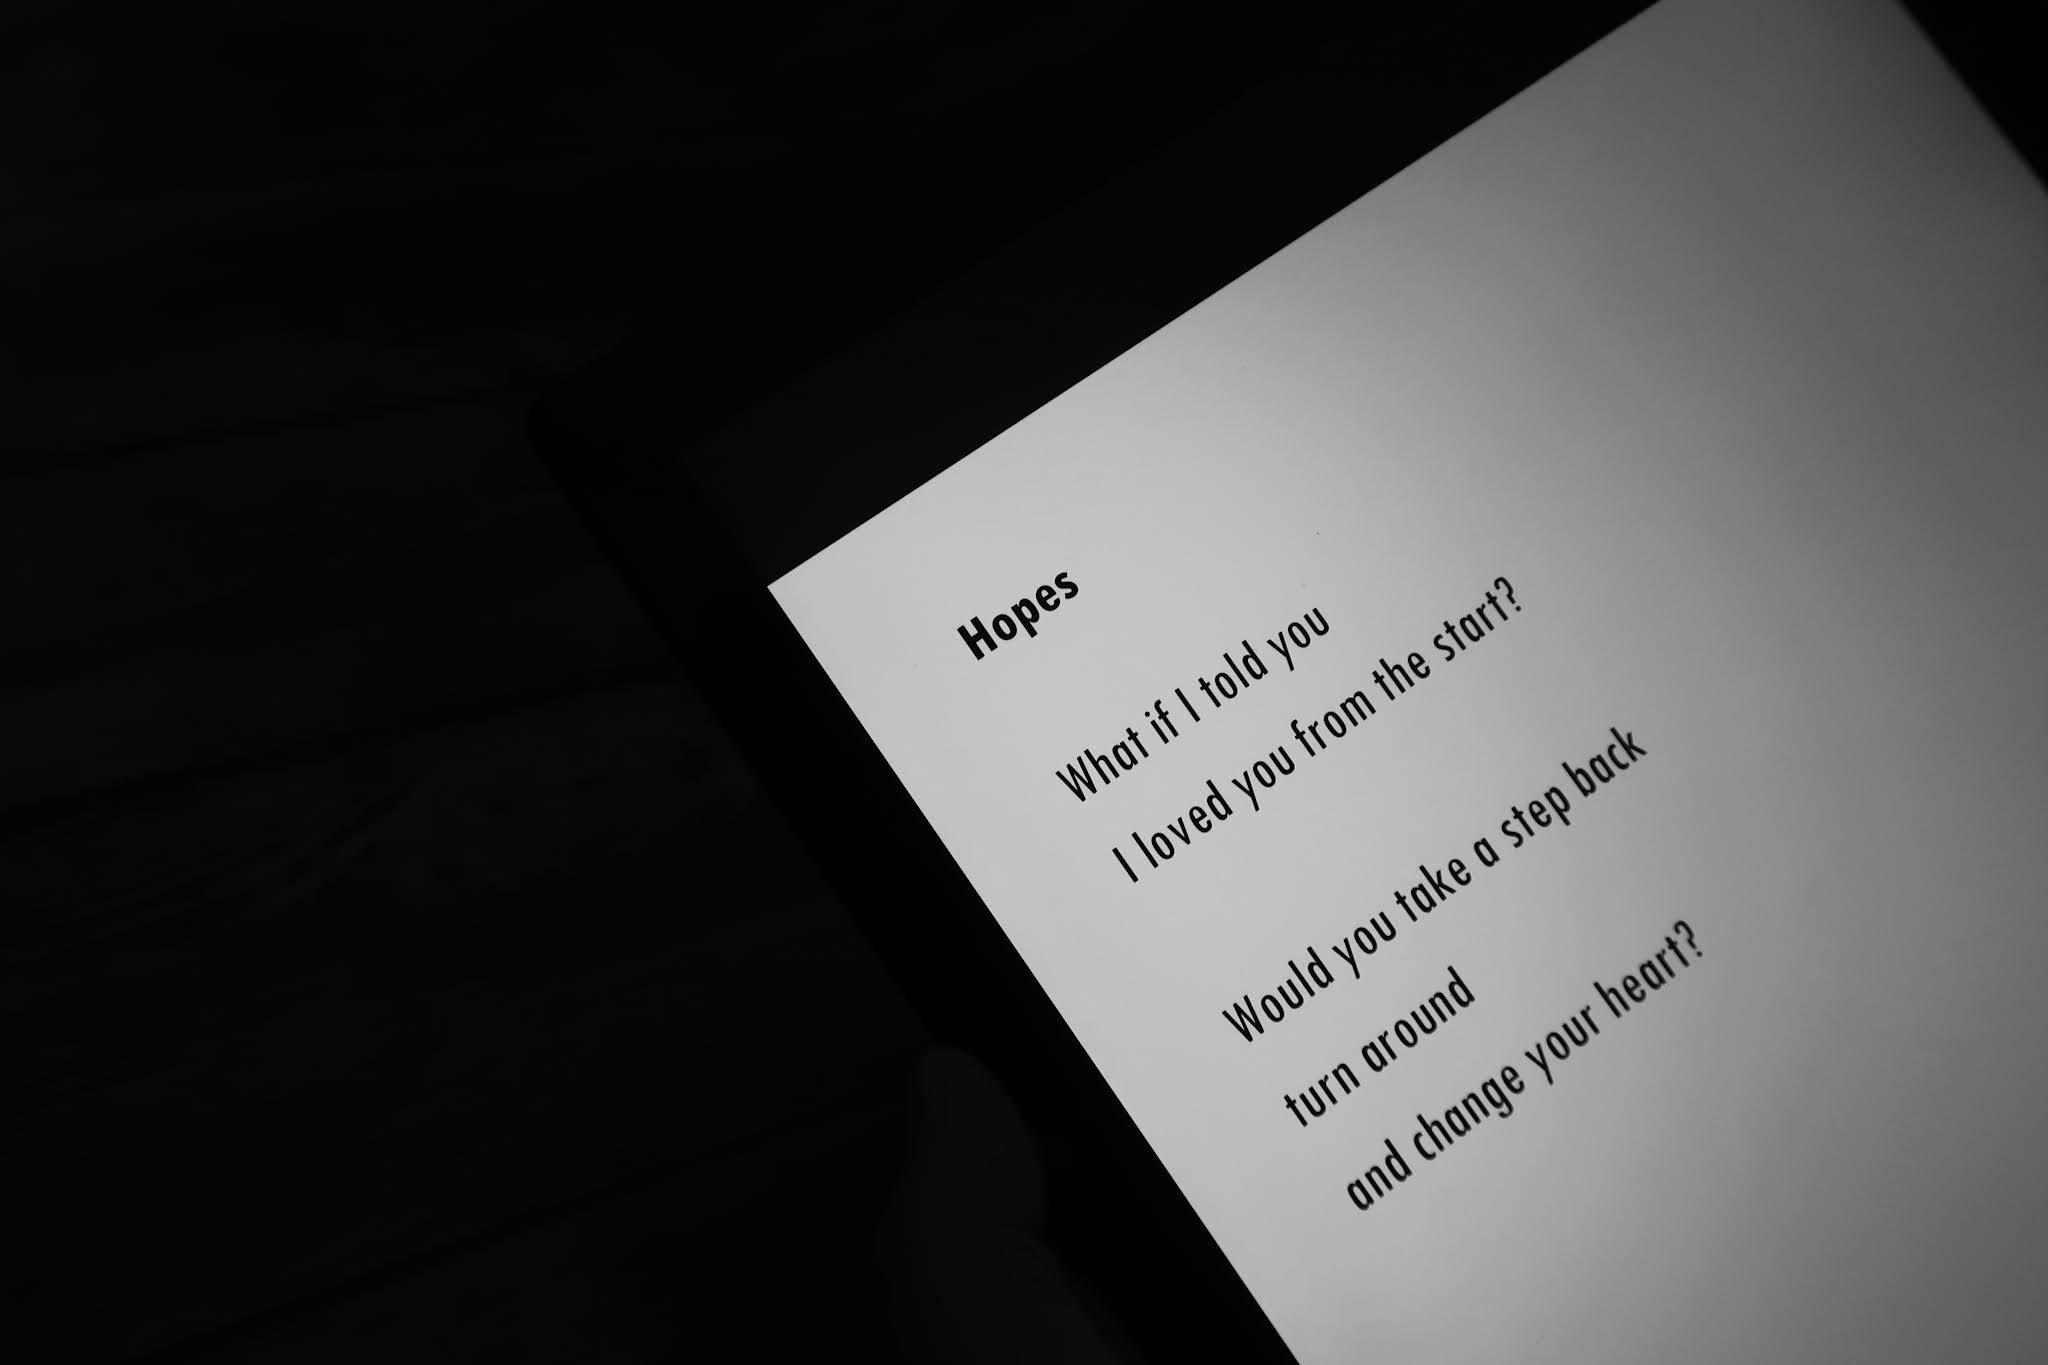 Hopes - Rhymes of Reason by Nirrosette